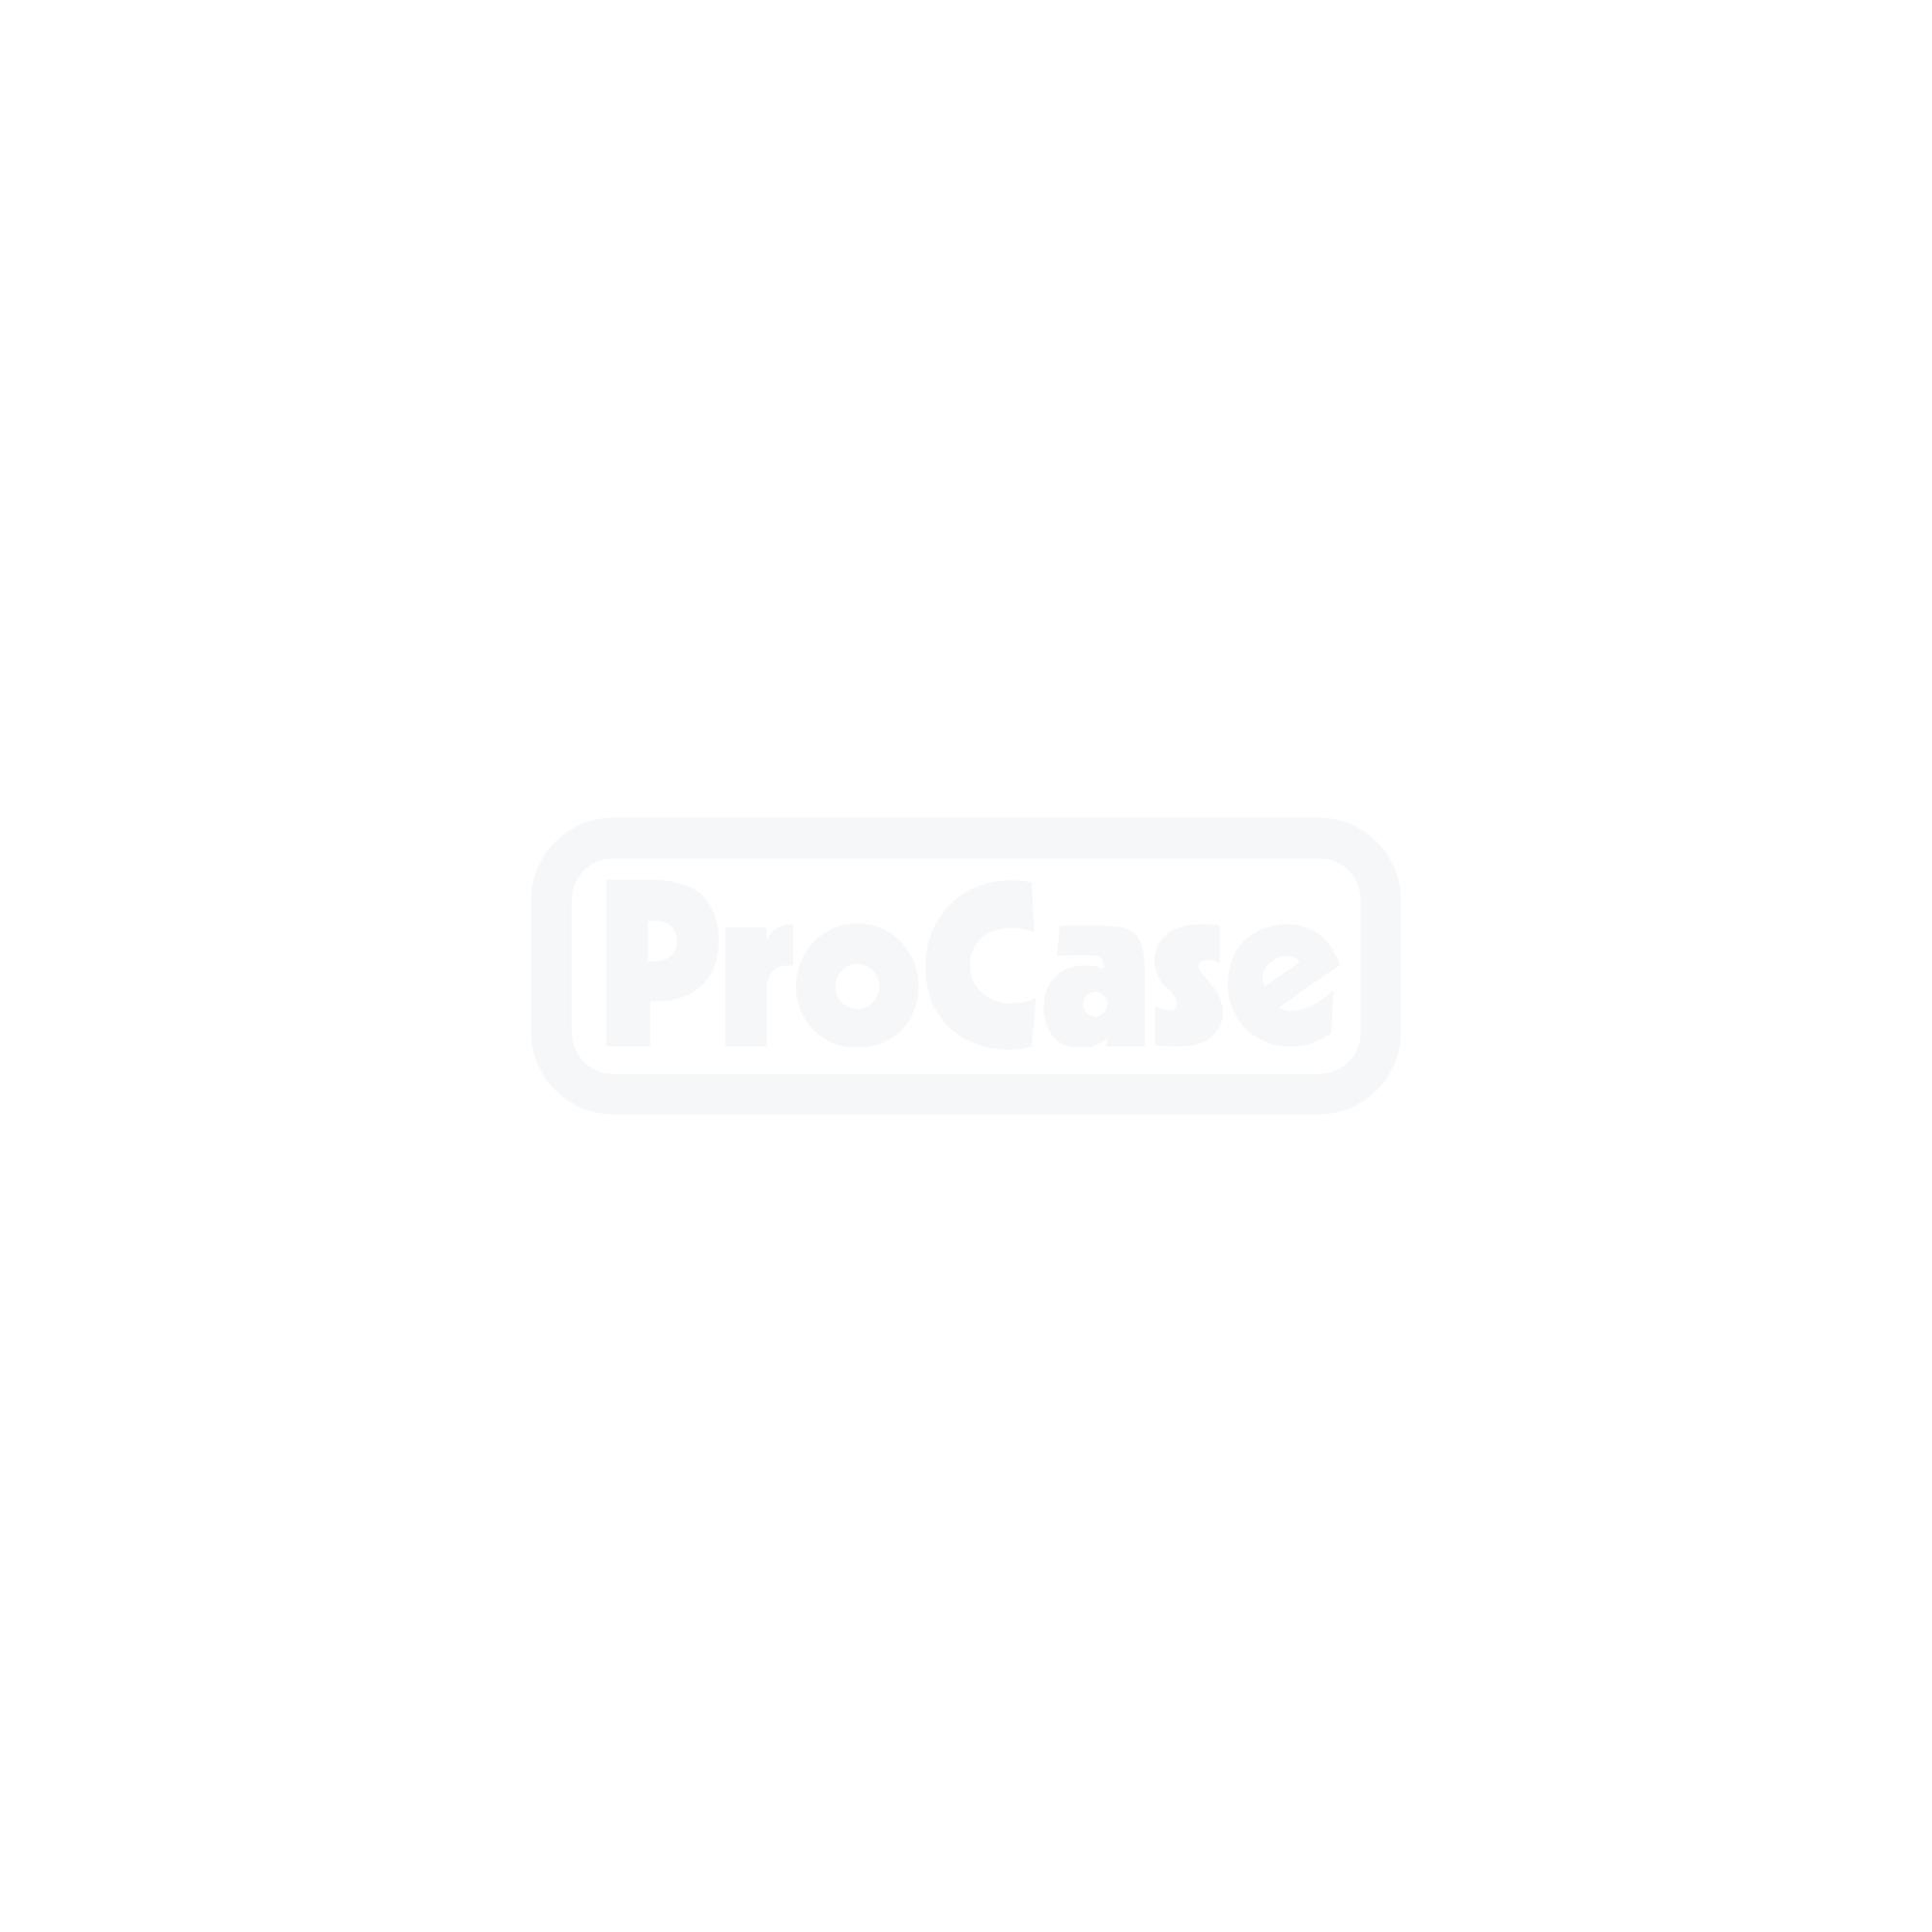 Flightcase für Sanyo PLC-HF15000 mit Pegasus Flugrahmen